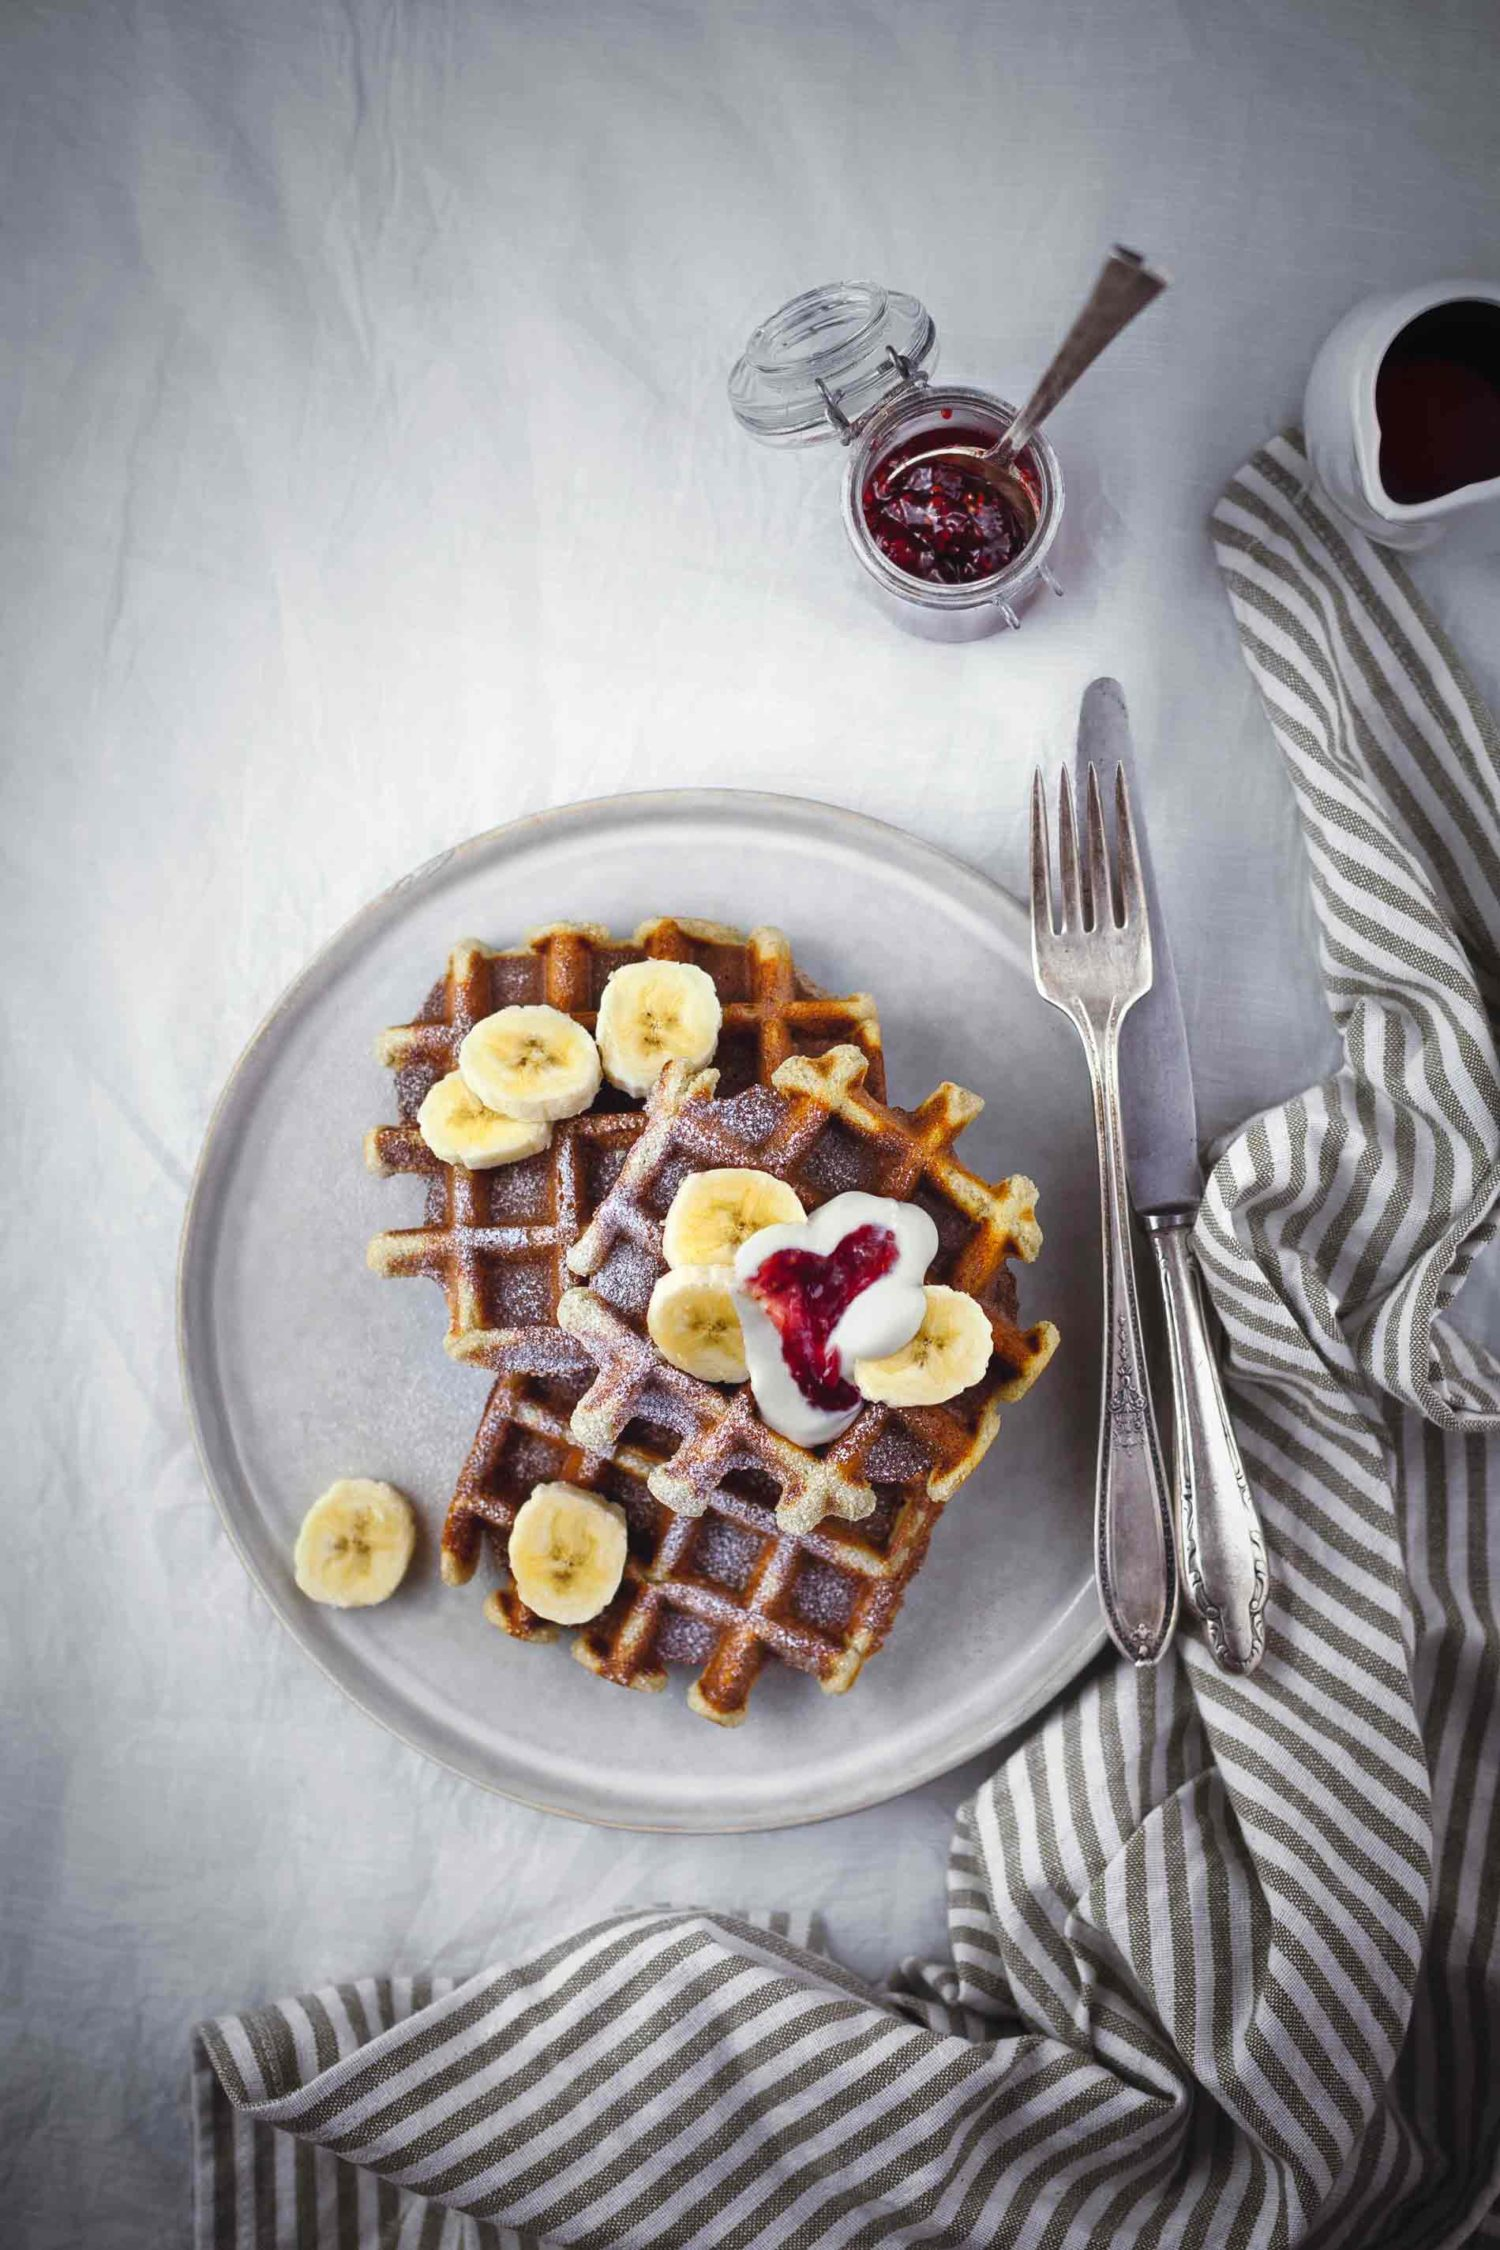 Banana_Waffles_Sour_Cream_1Marleen_Visser_ShareLoveNotSecrets